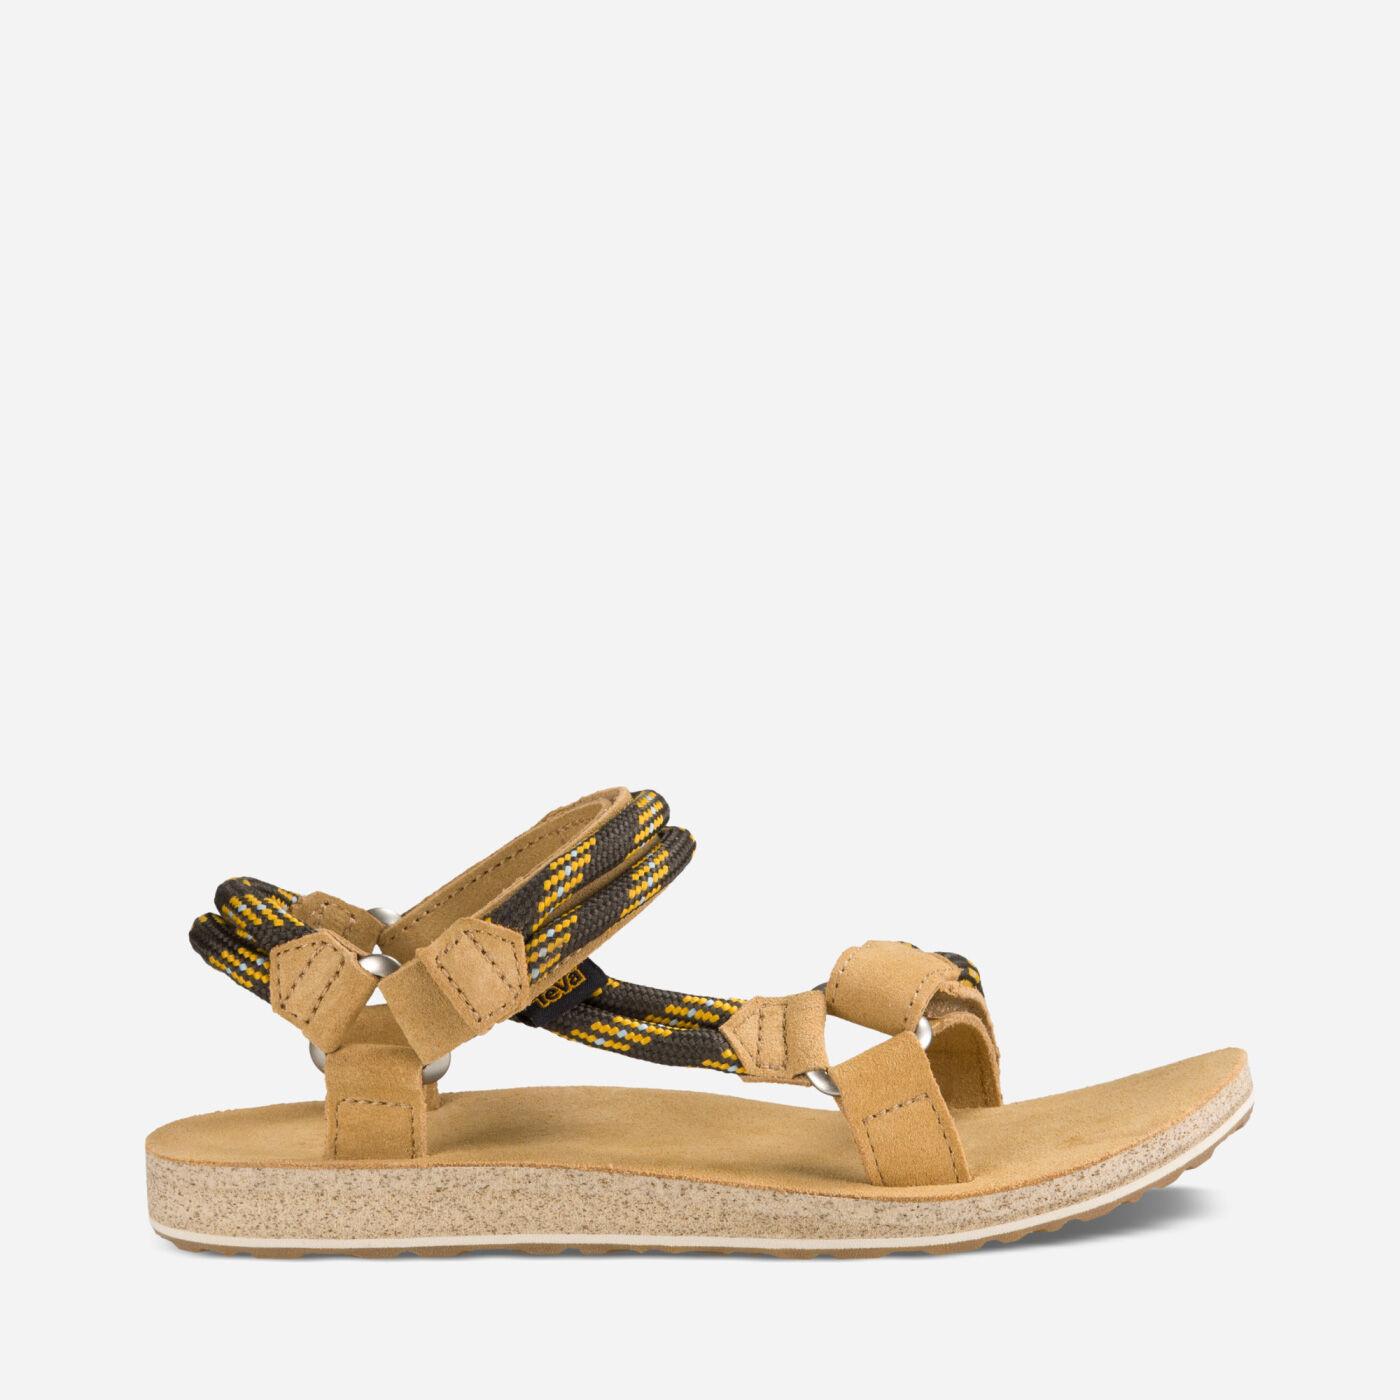 Black sandals gold bar - Original Universal Rope